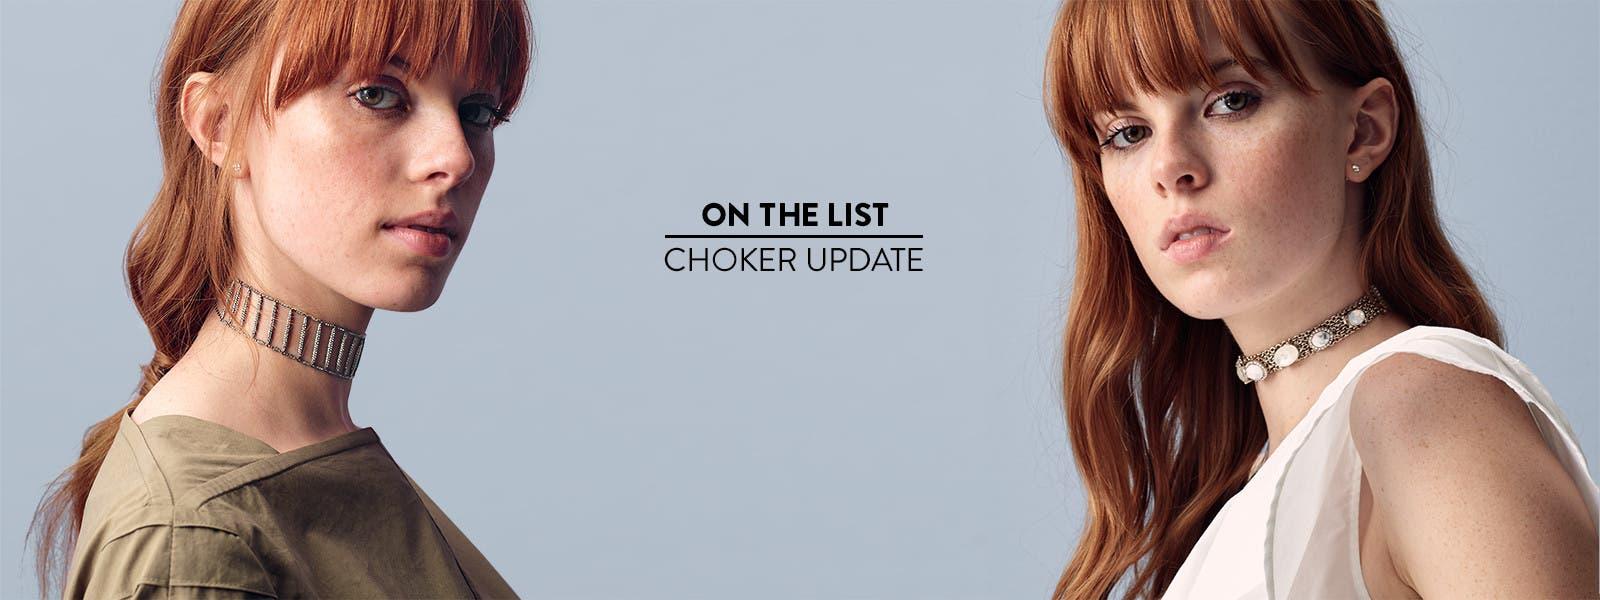 Choker update: versatile choker styles.